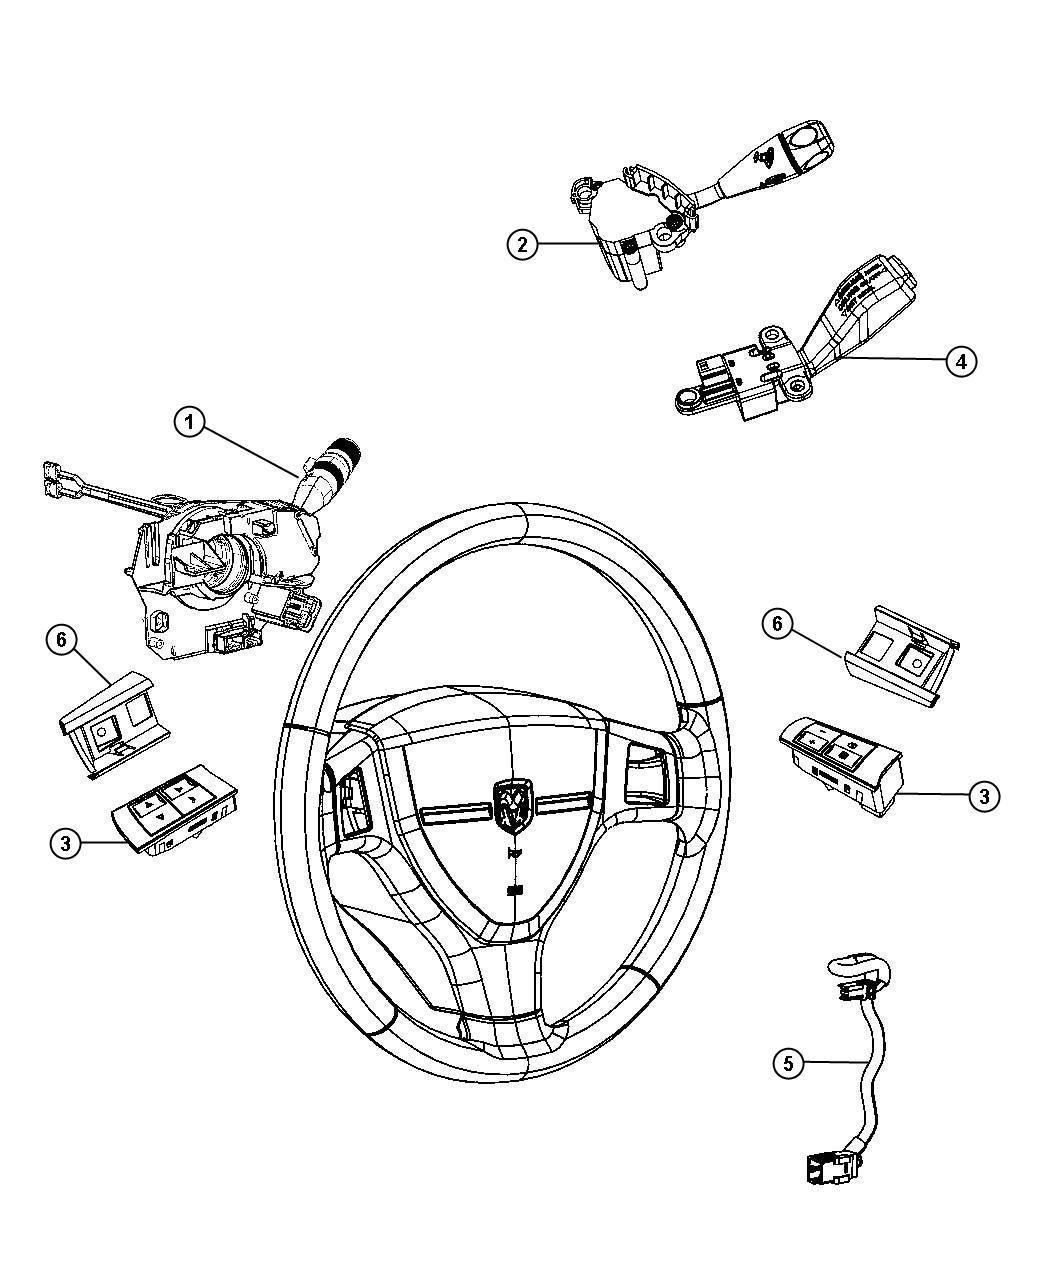 Dodge Charger Switch Multifunction Tilt Steering